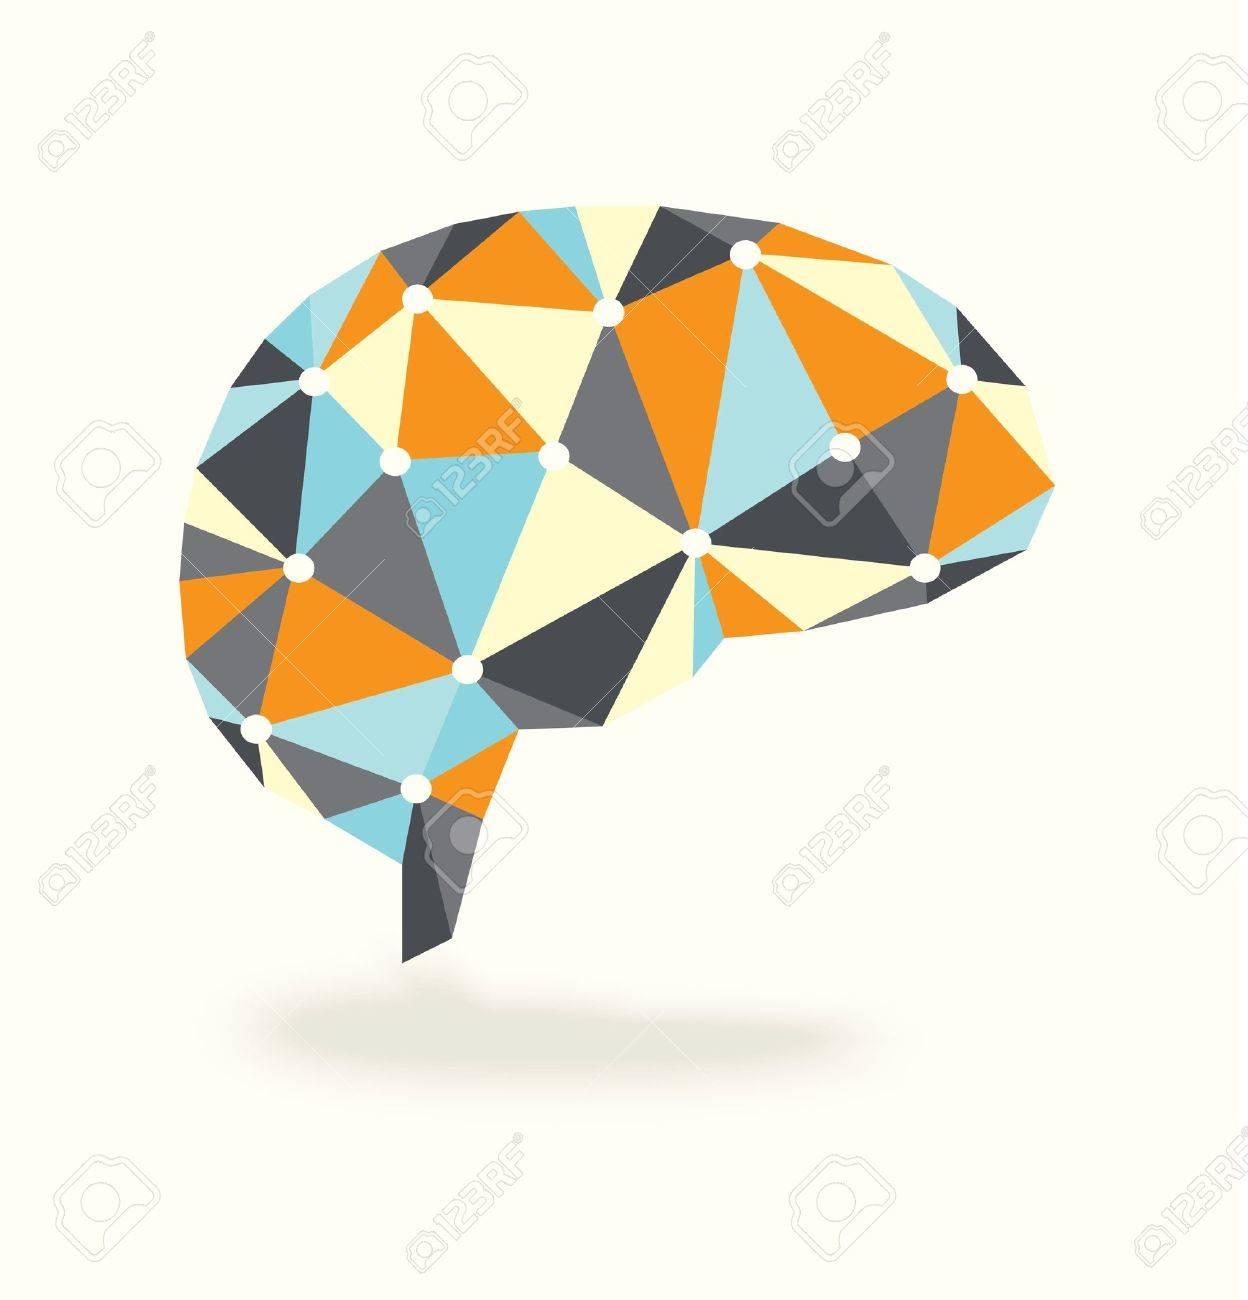 Vector Brain Activity is Retro Abstract Design Stock Vector - 19089193